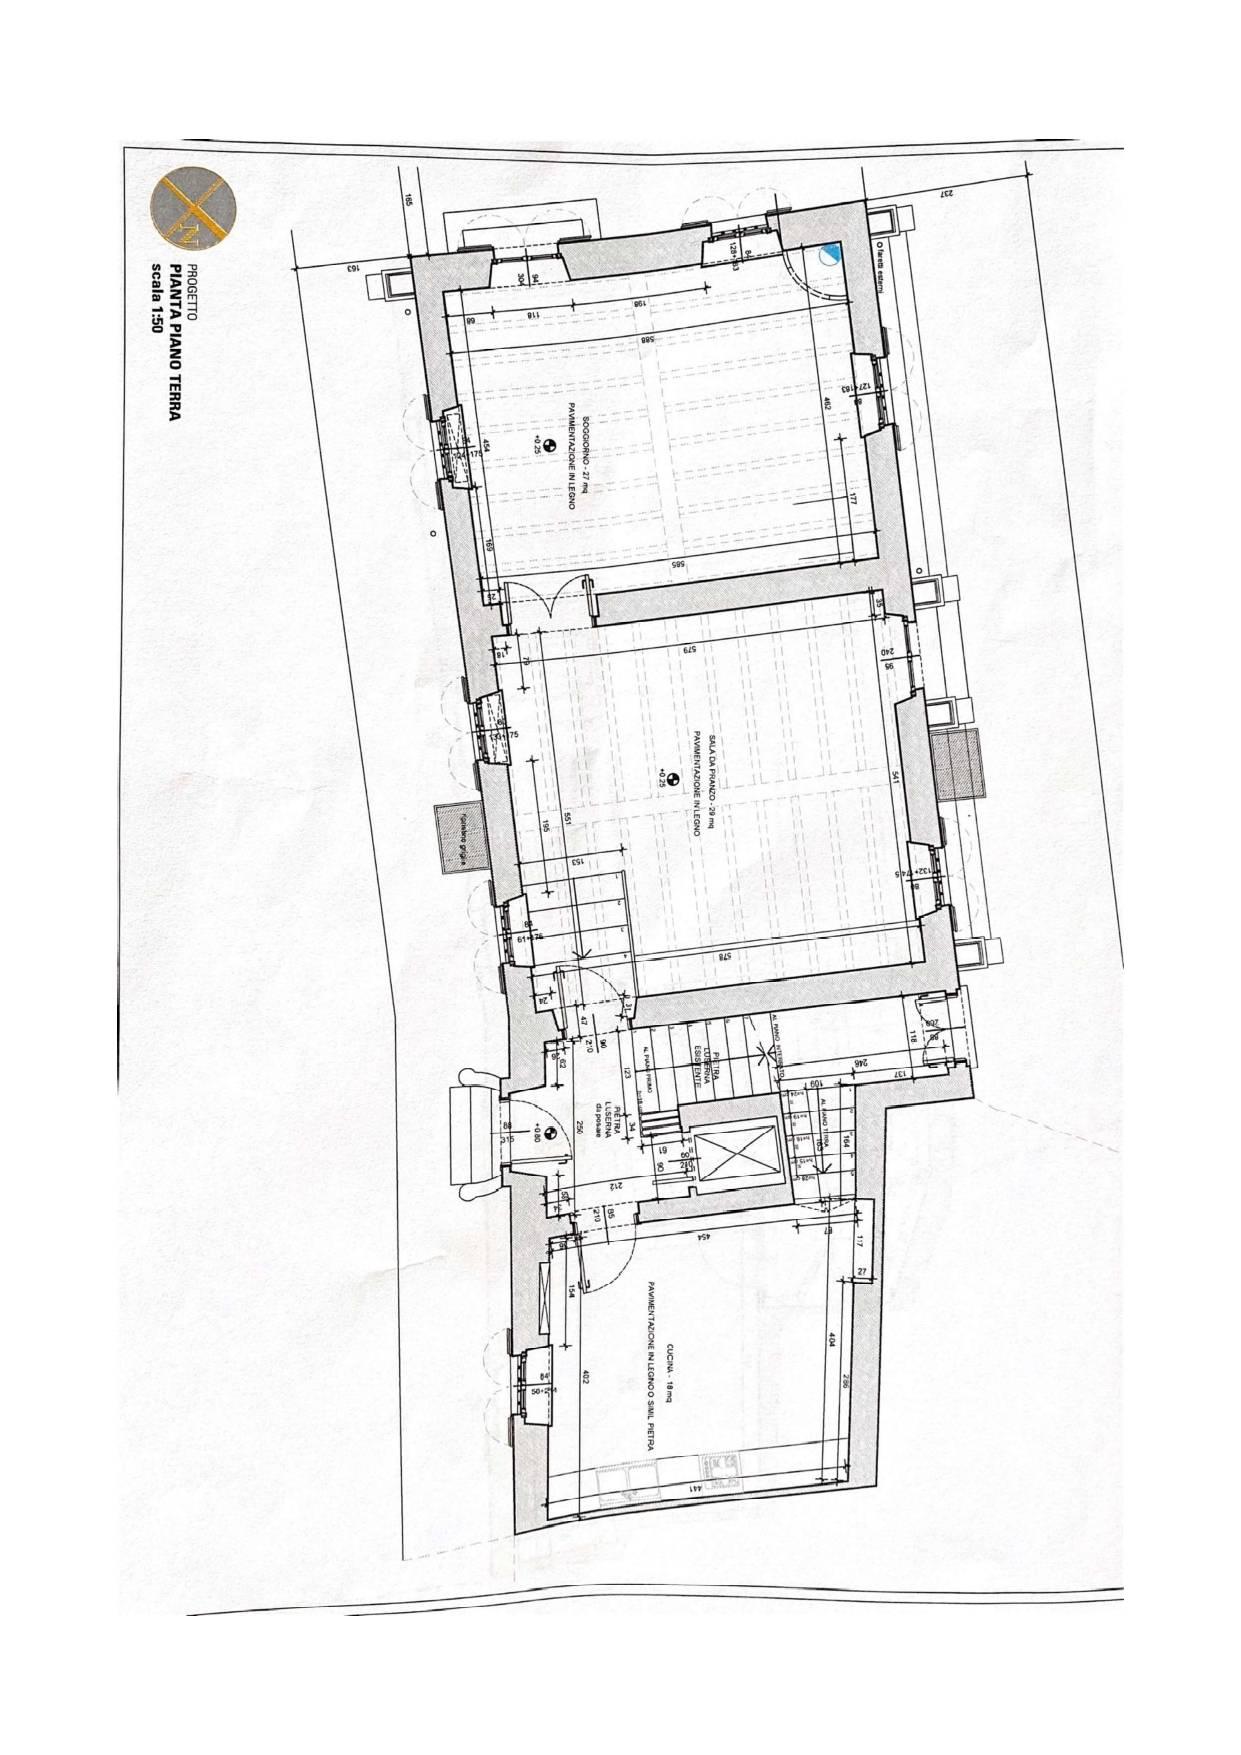 Casa indipendente in Vendita a Torino: 5 locali, 400 mq - Foto 21